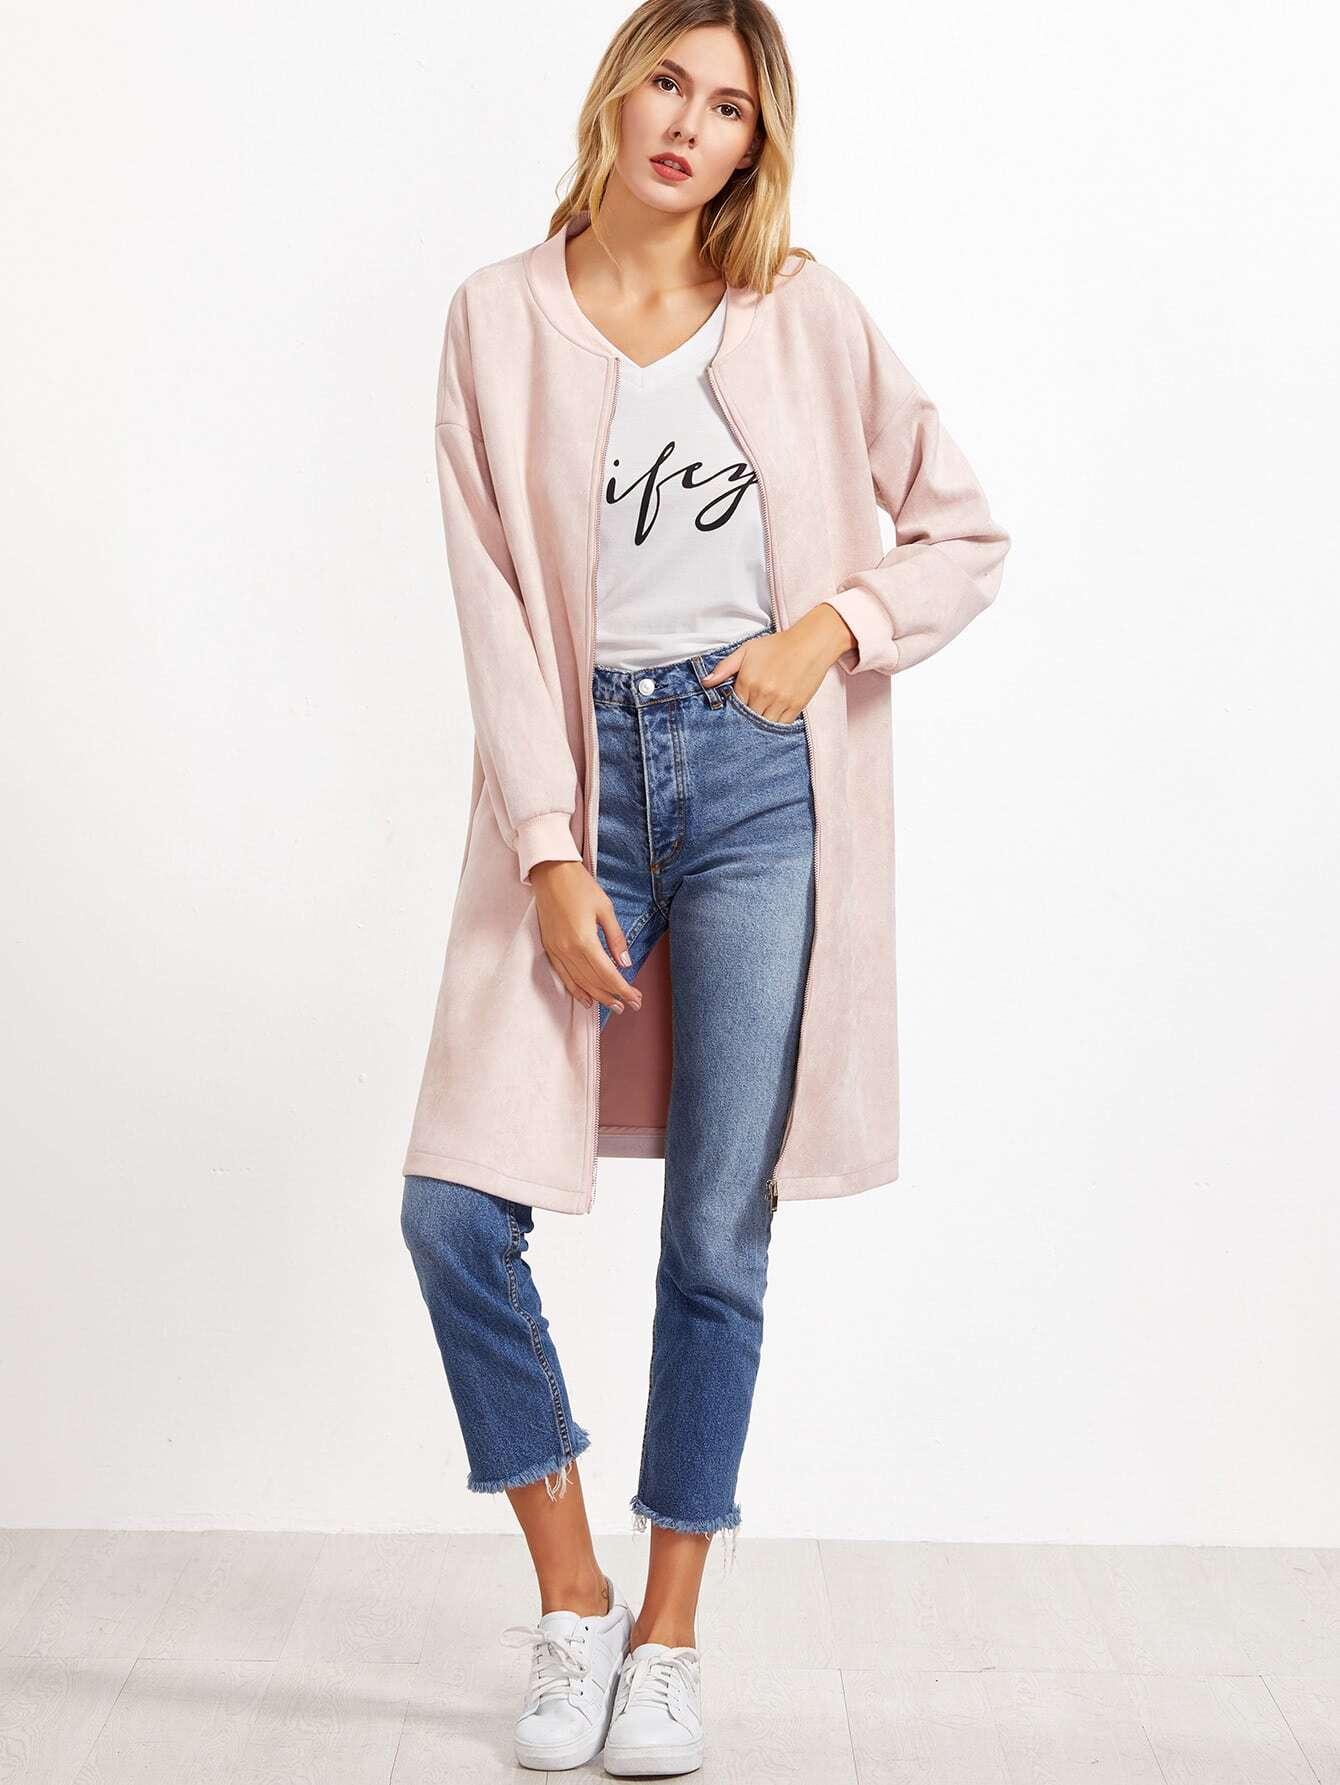 Pink Suede Zip Up Side Slit Bomber Jacket zip up jacket